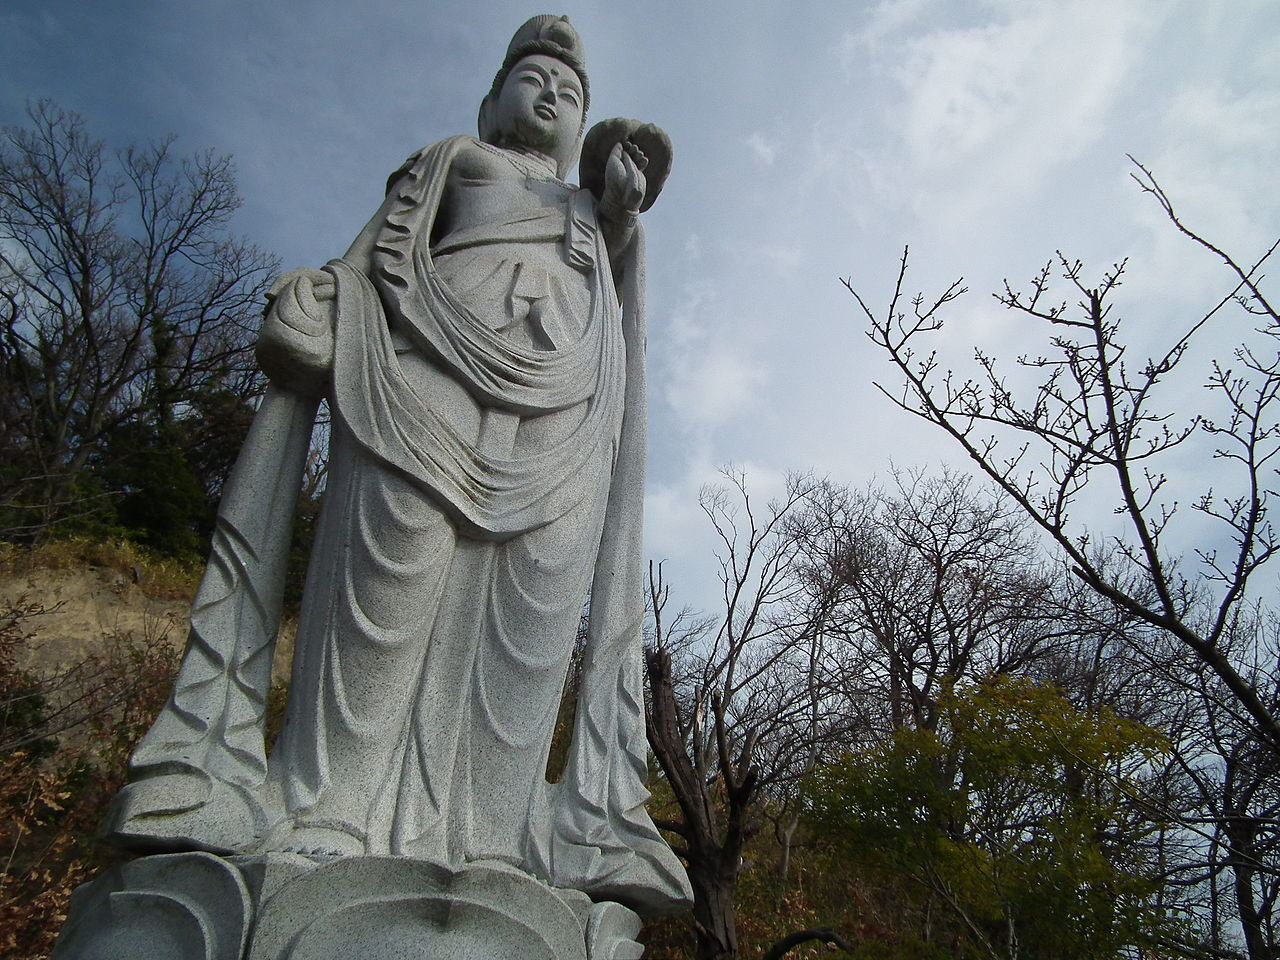 1280px-Maruyama-kanon_丸山観音_DSCF2080